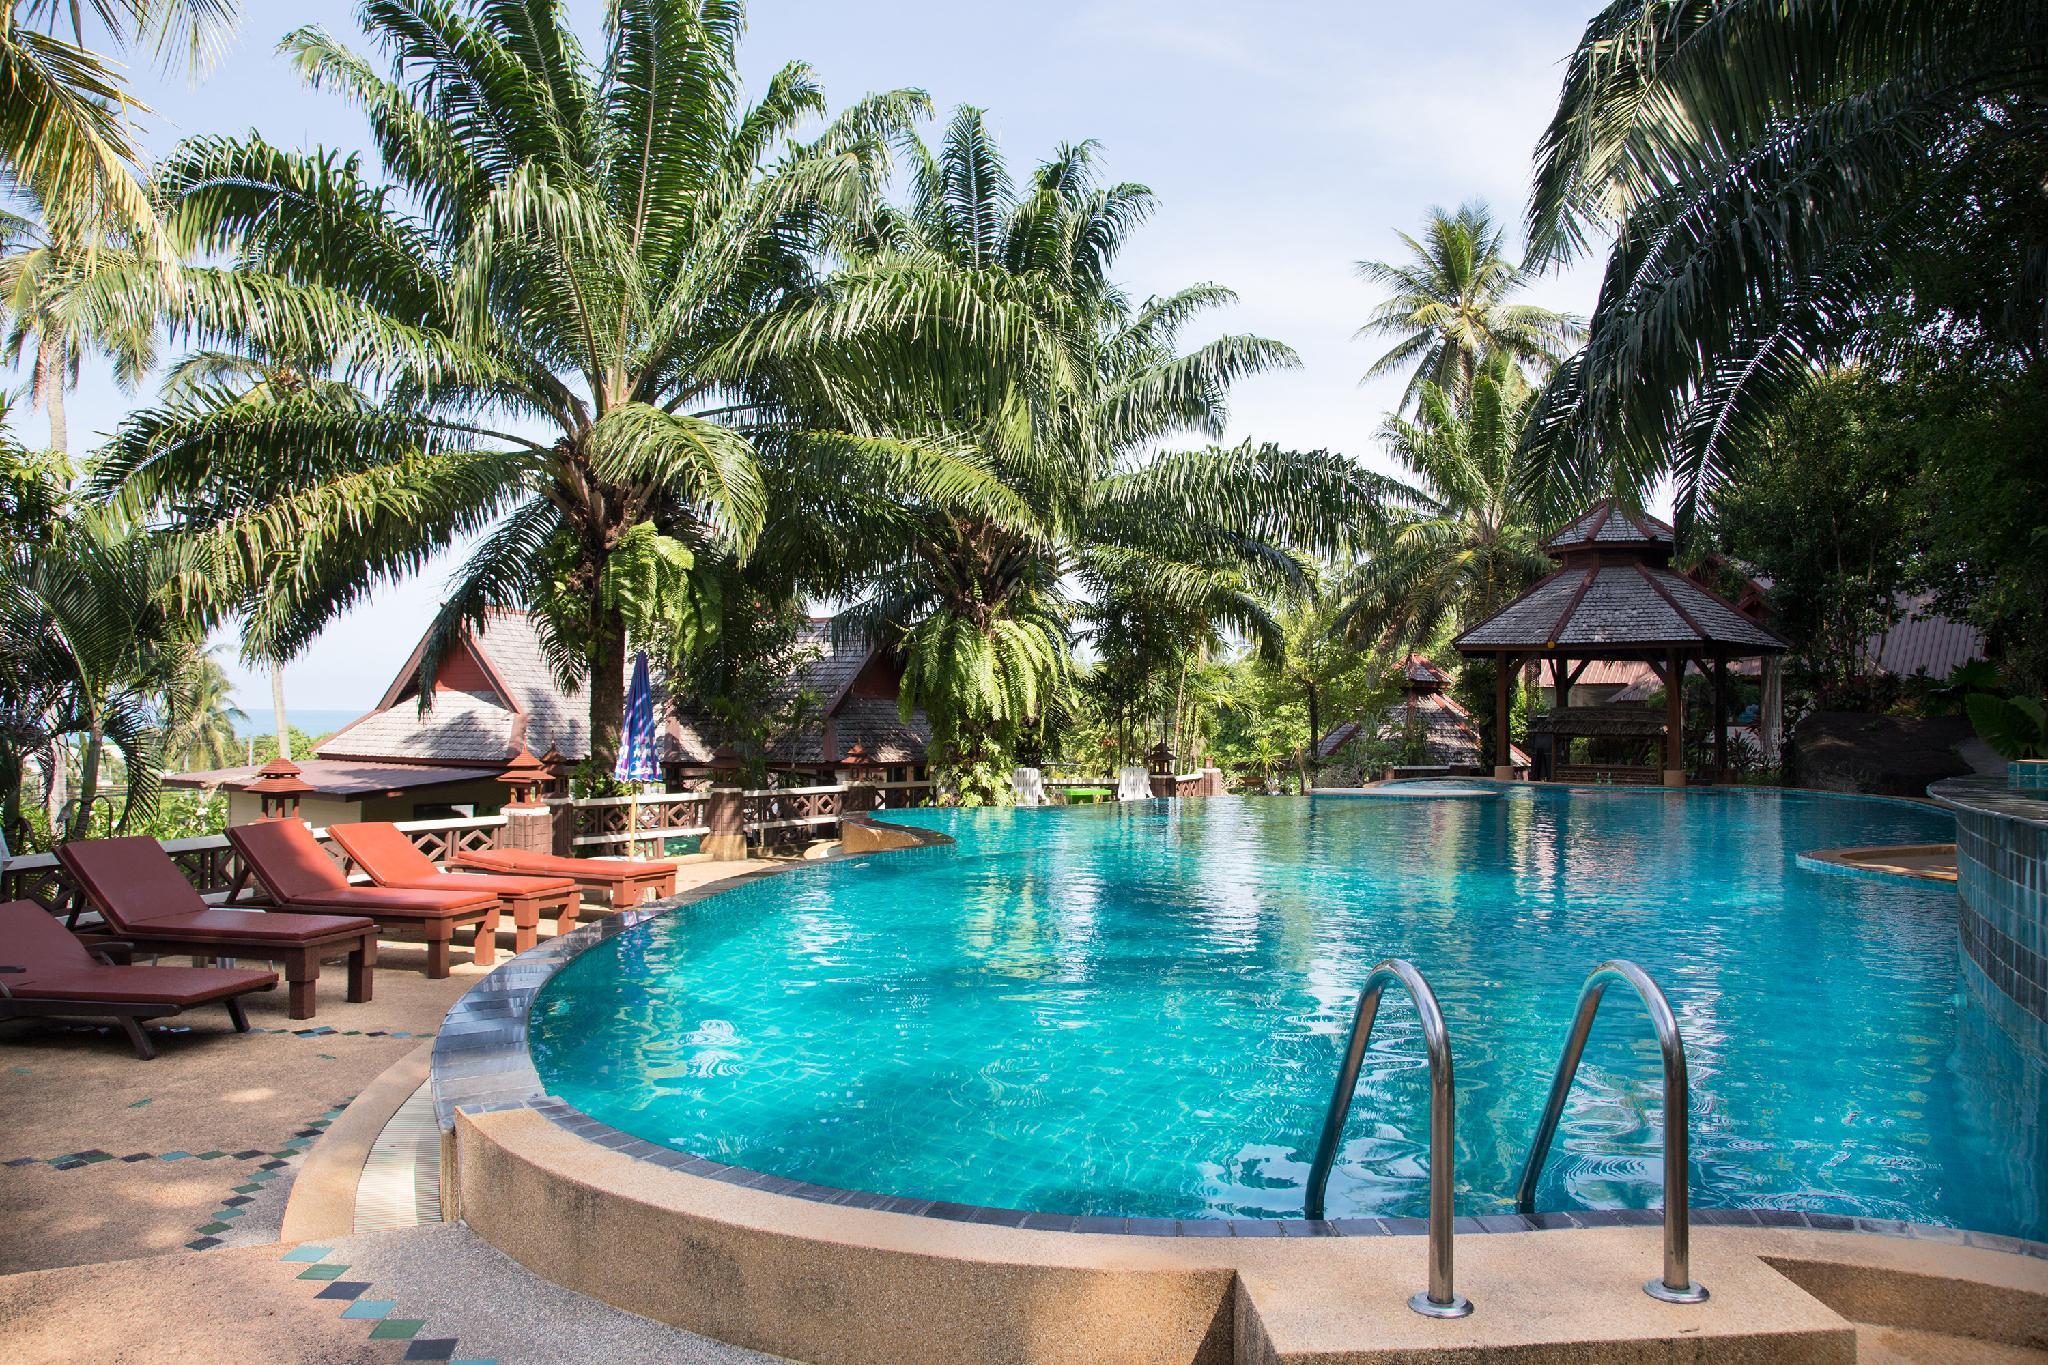 Best Price on Searine Samui Boutique Resort in Samui + Reviews!